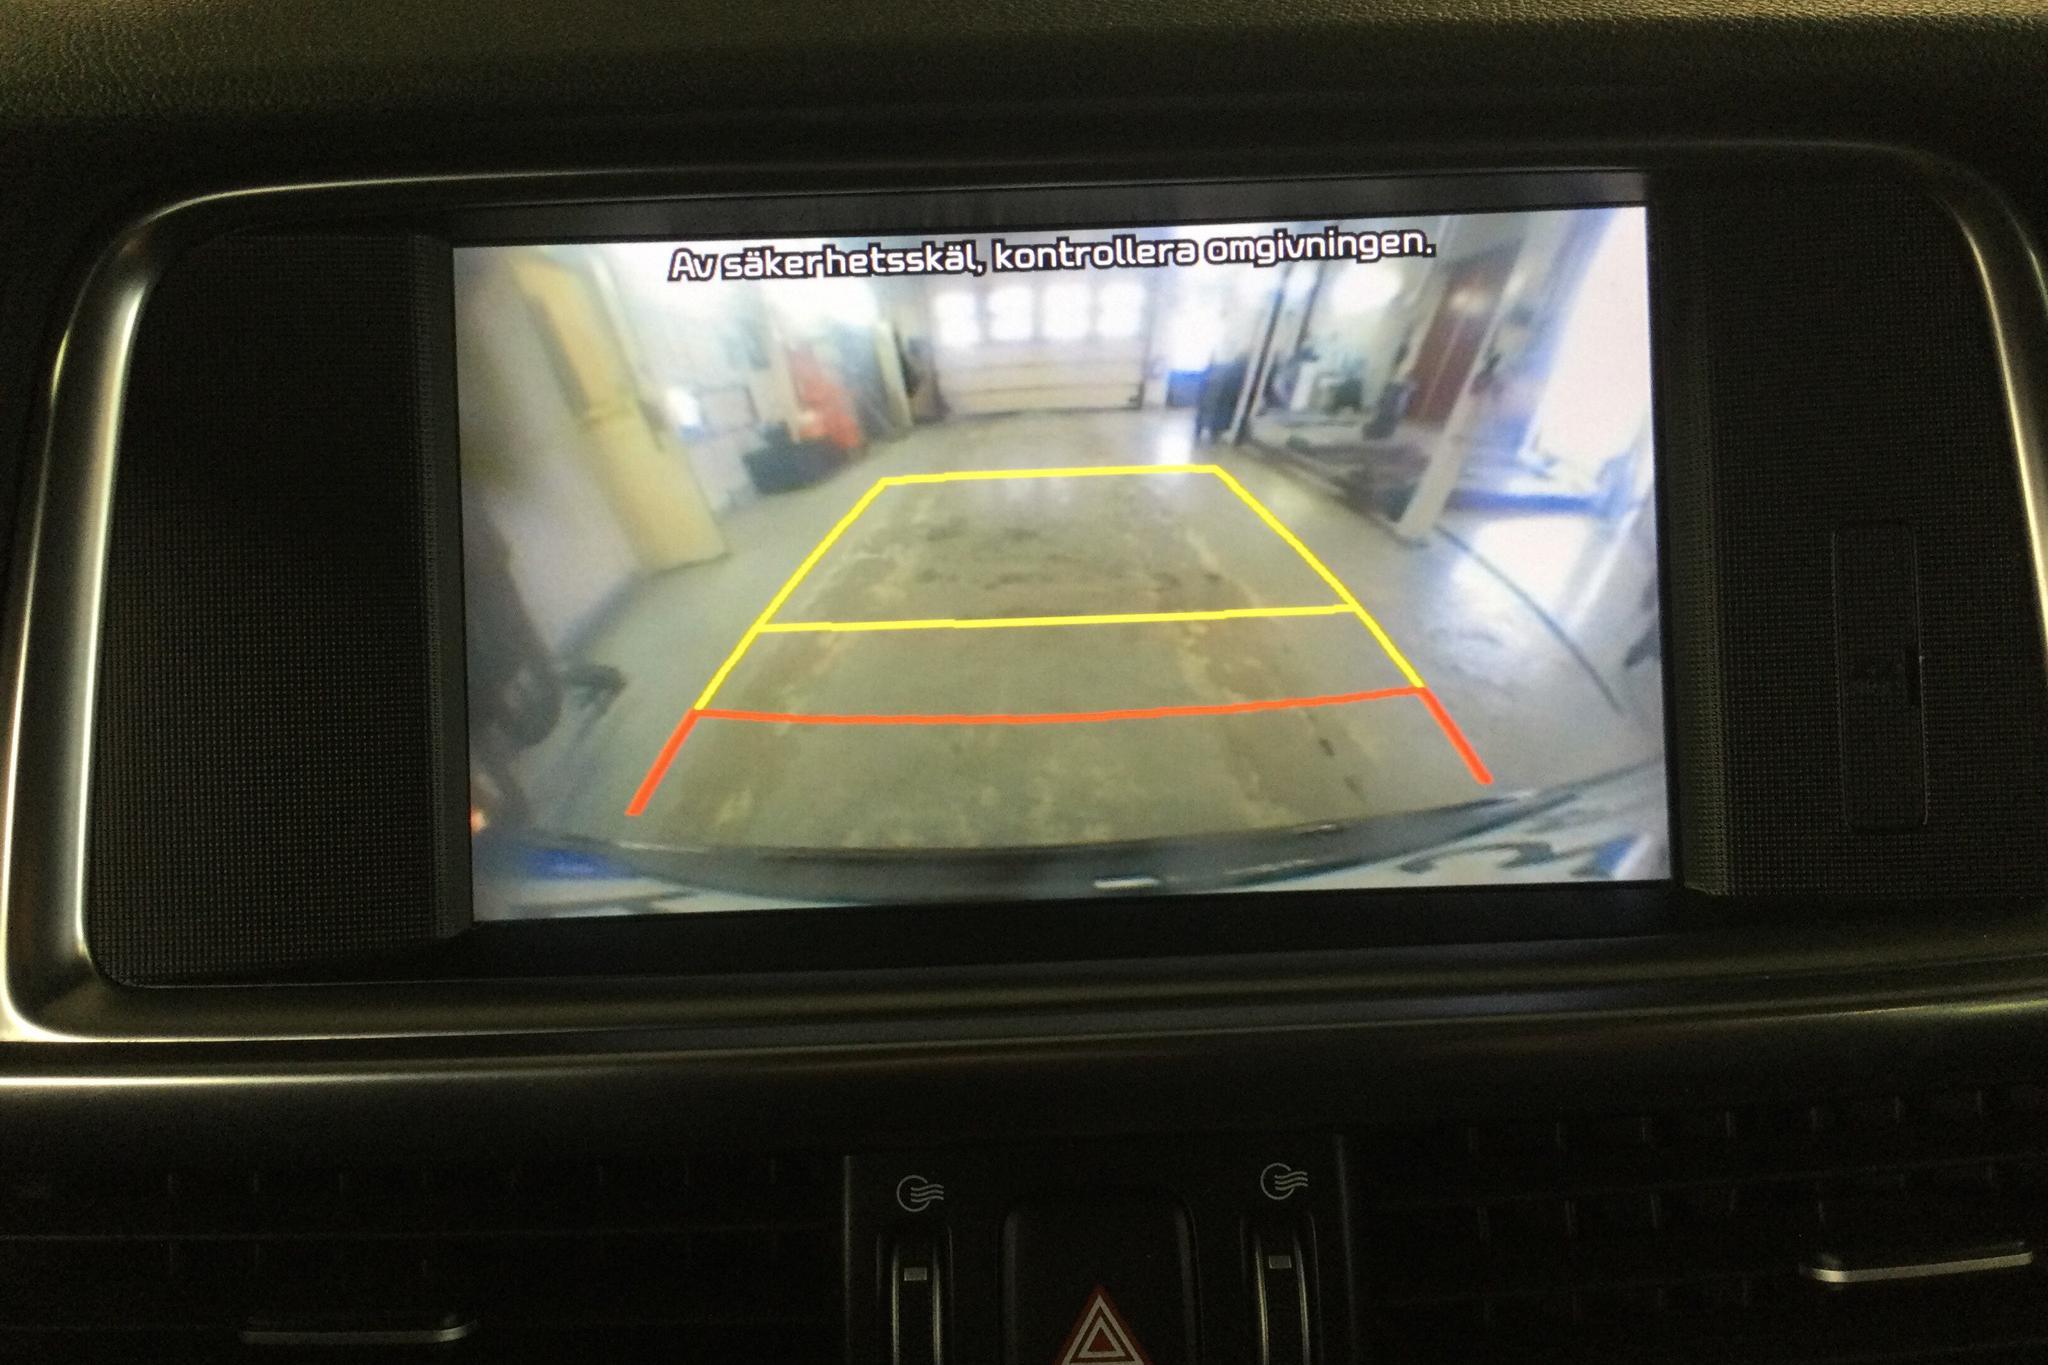 KIA Optima 2.0 GDi Plug-in Hybrid (205hk) - 75 020 km - Automatic - gray - 2017